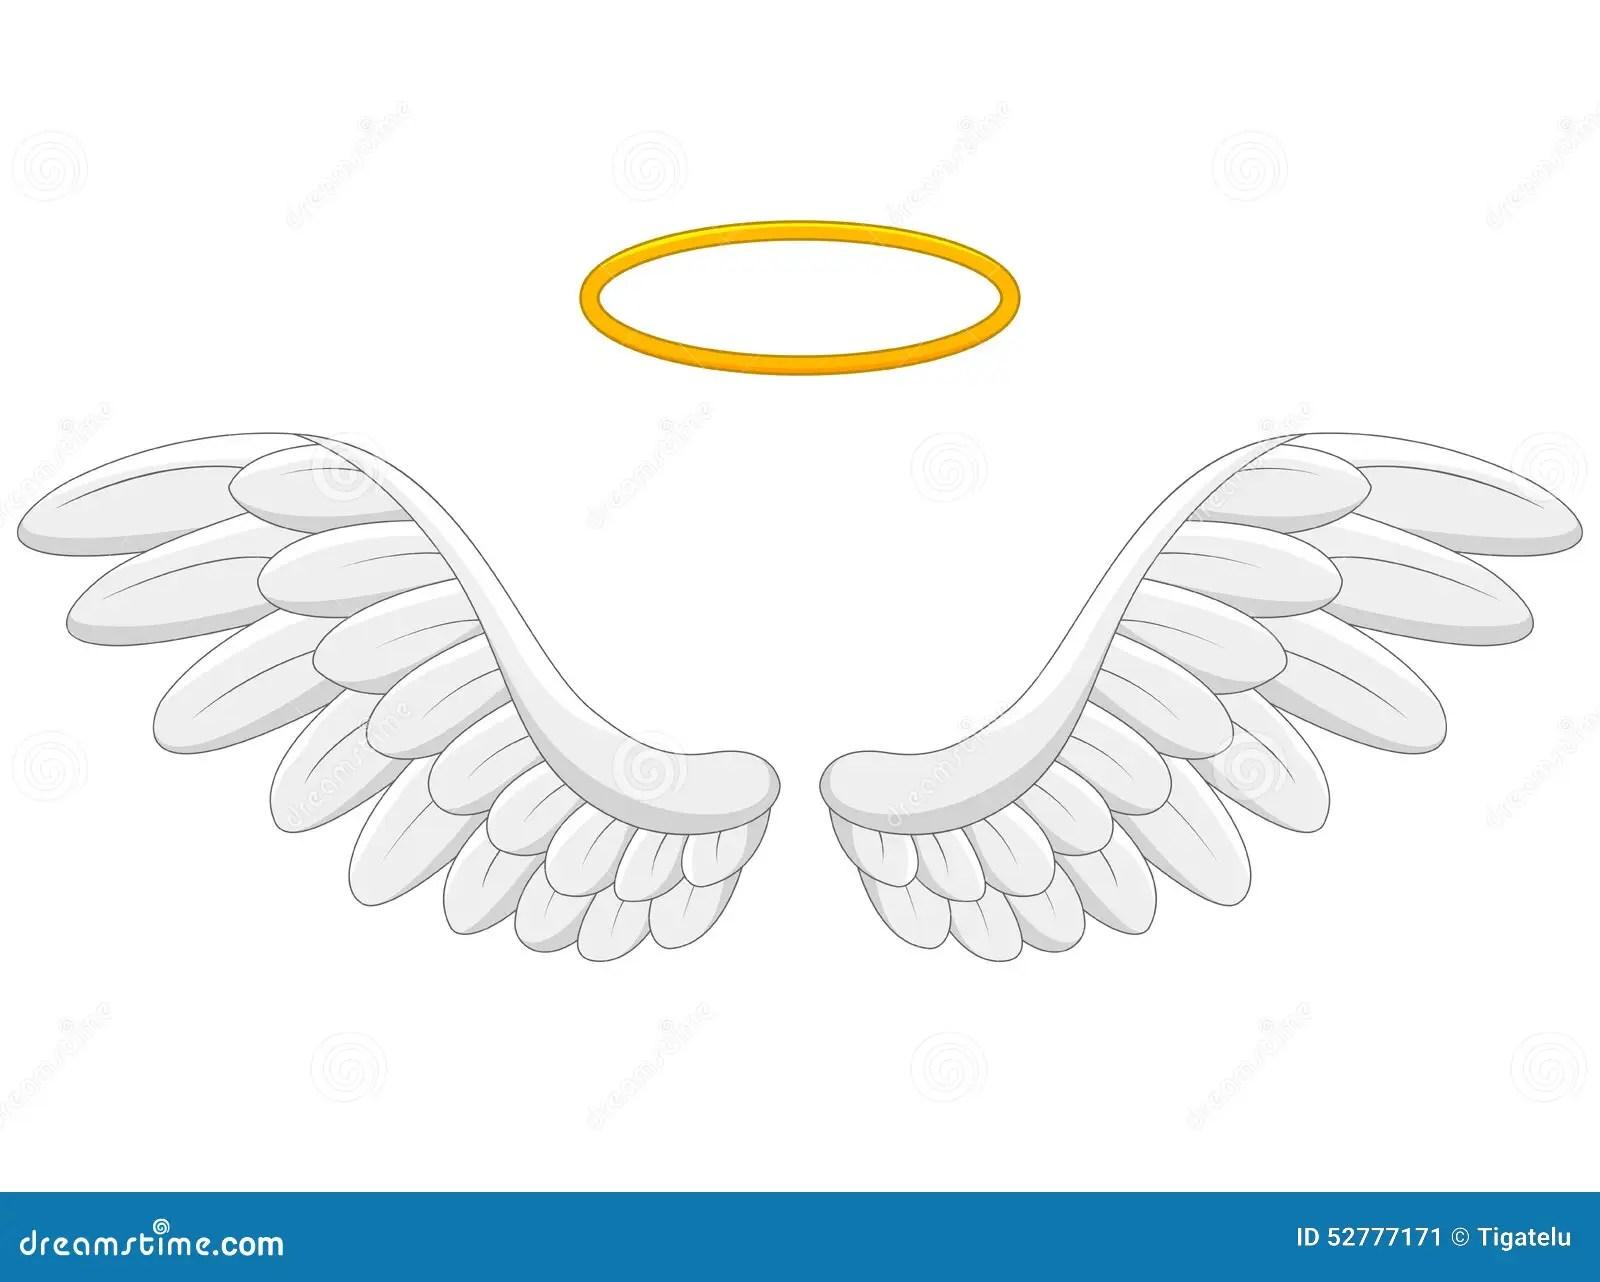 Angel Wings Cartoon Stock Vector Illustration Of Simple